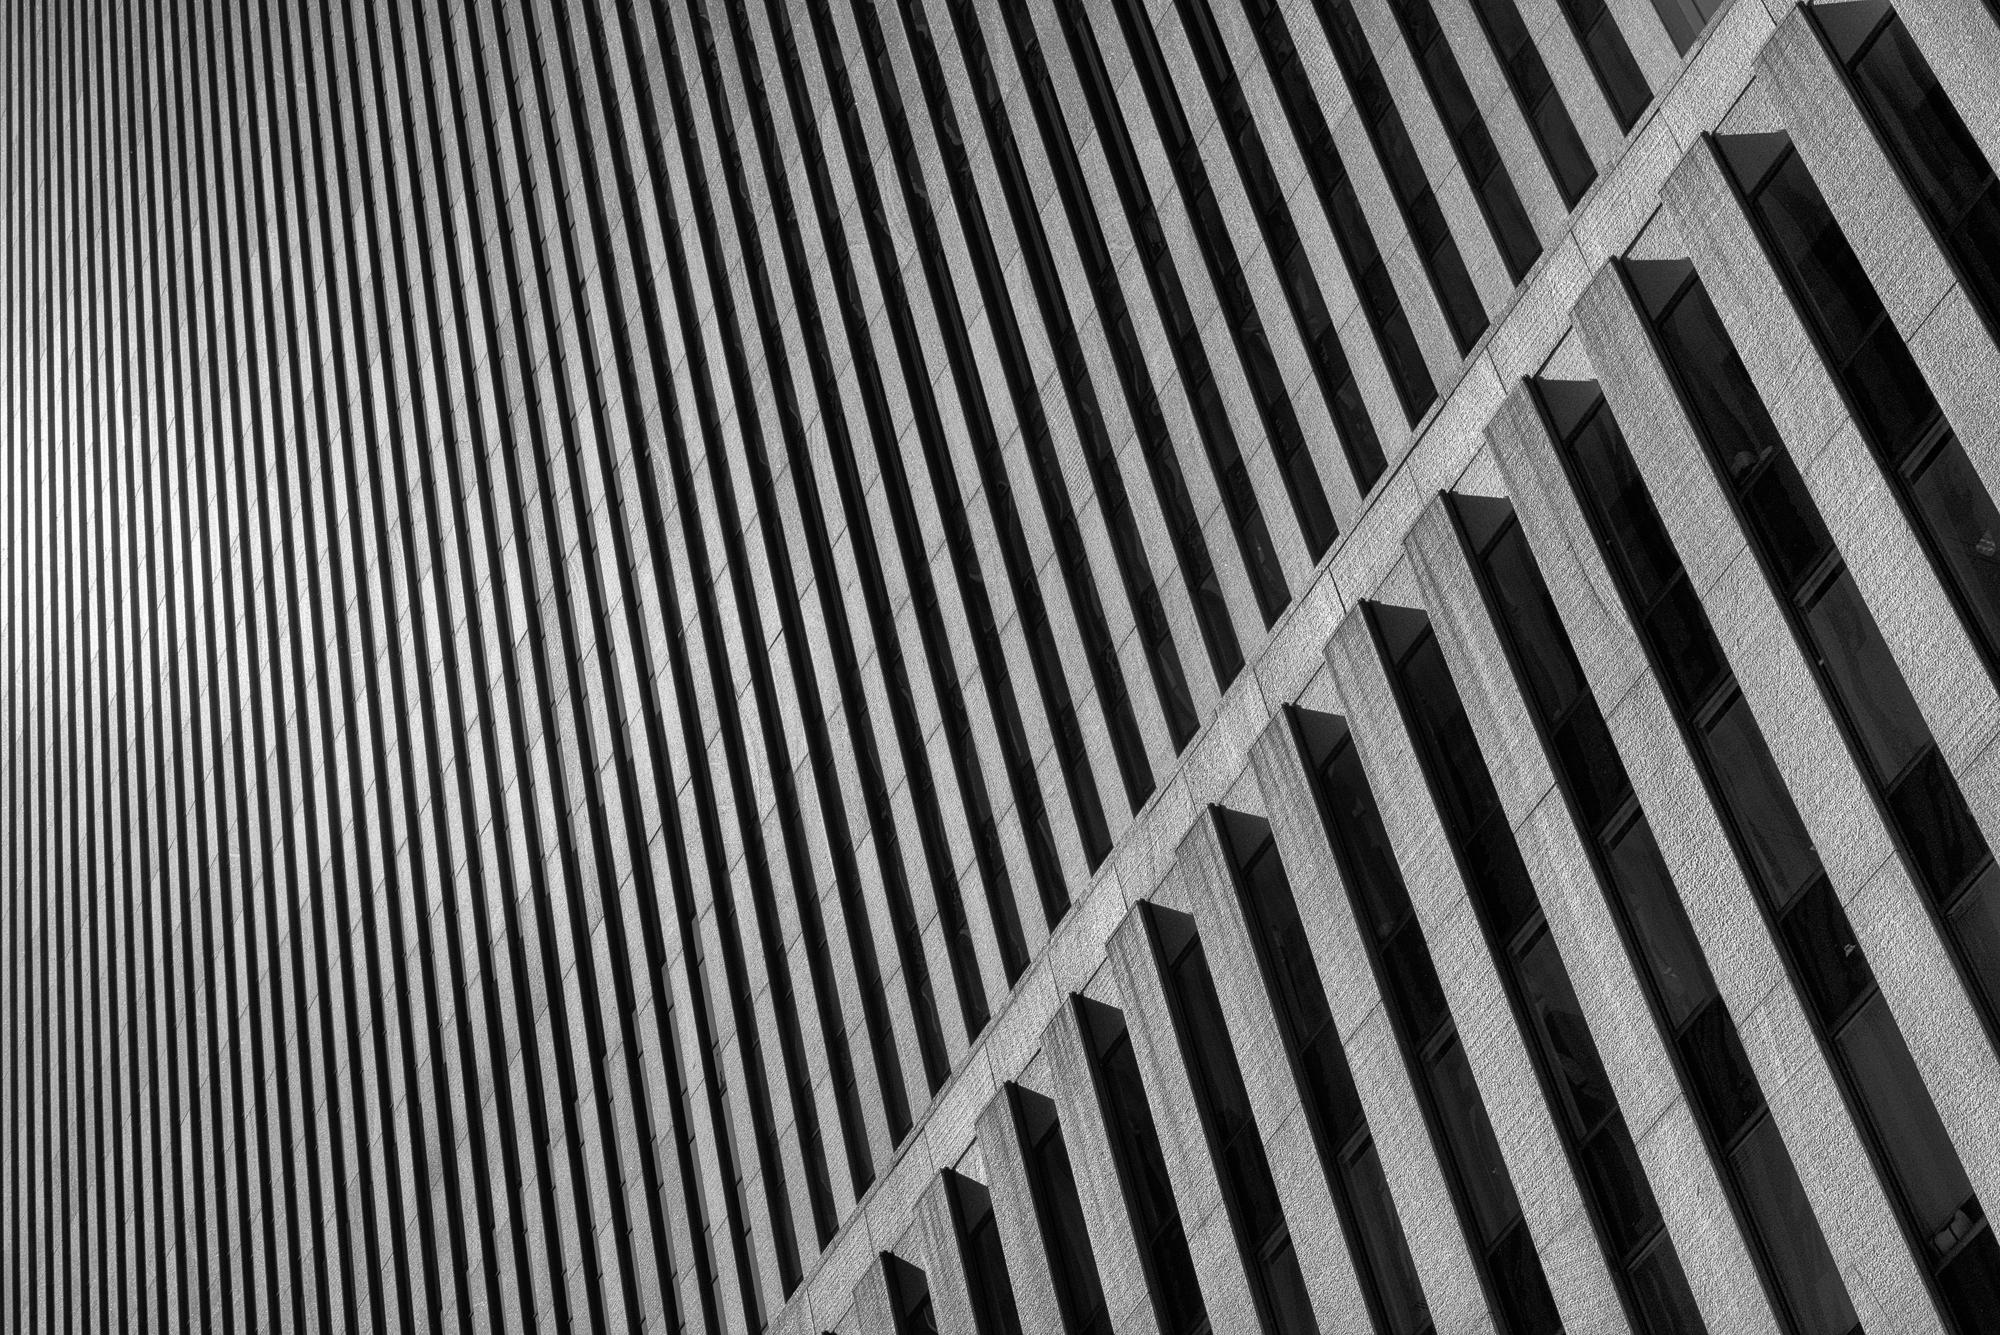 An Orwellian New York. NYC, NY, 2015